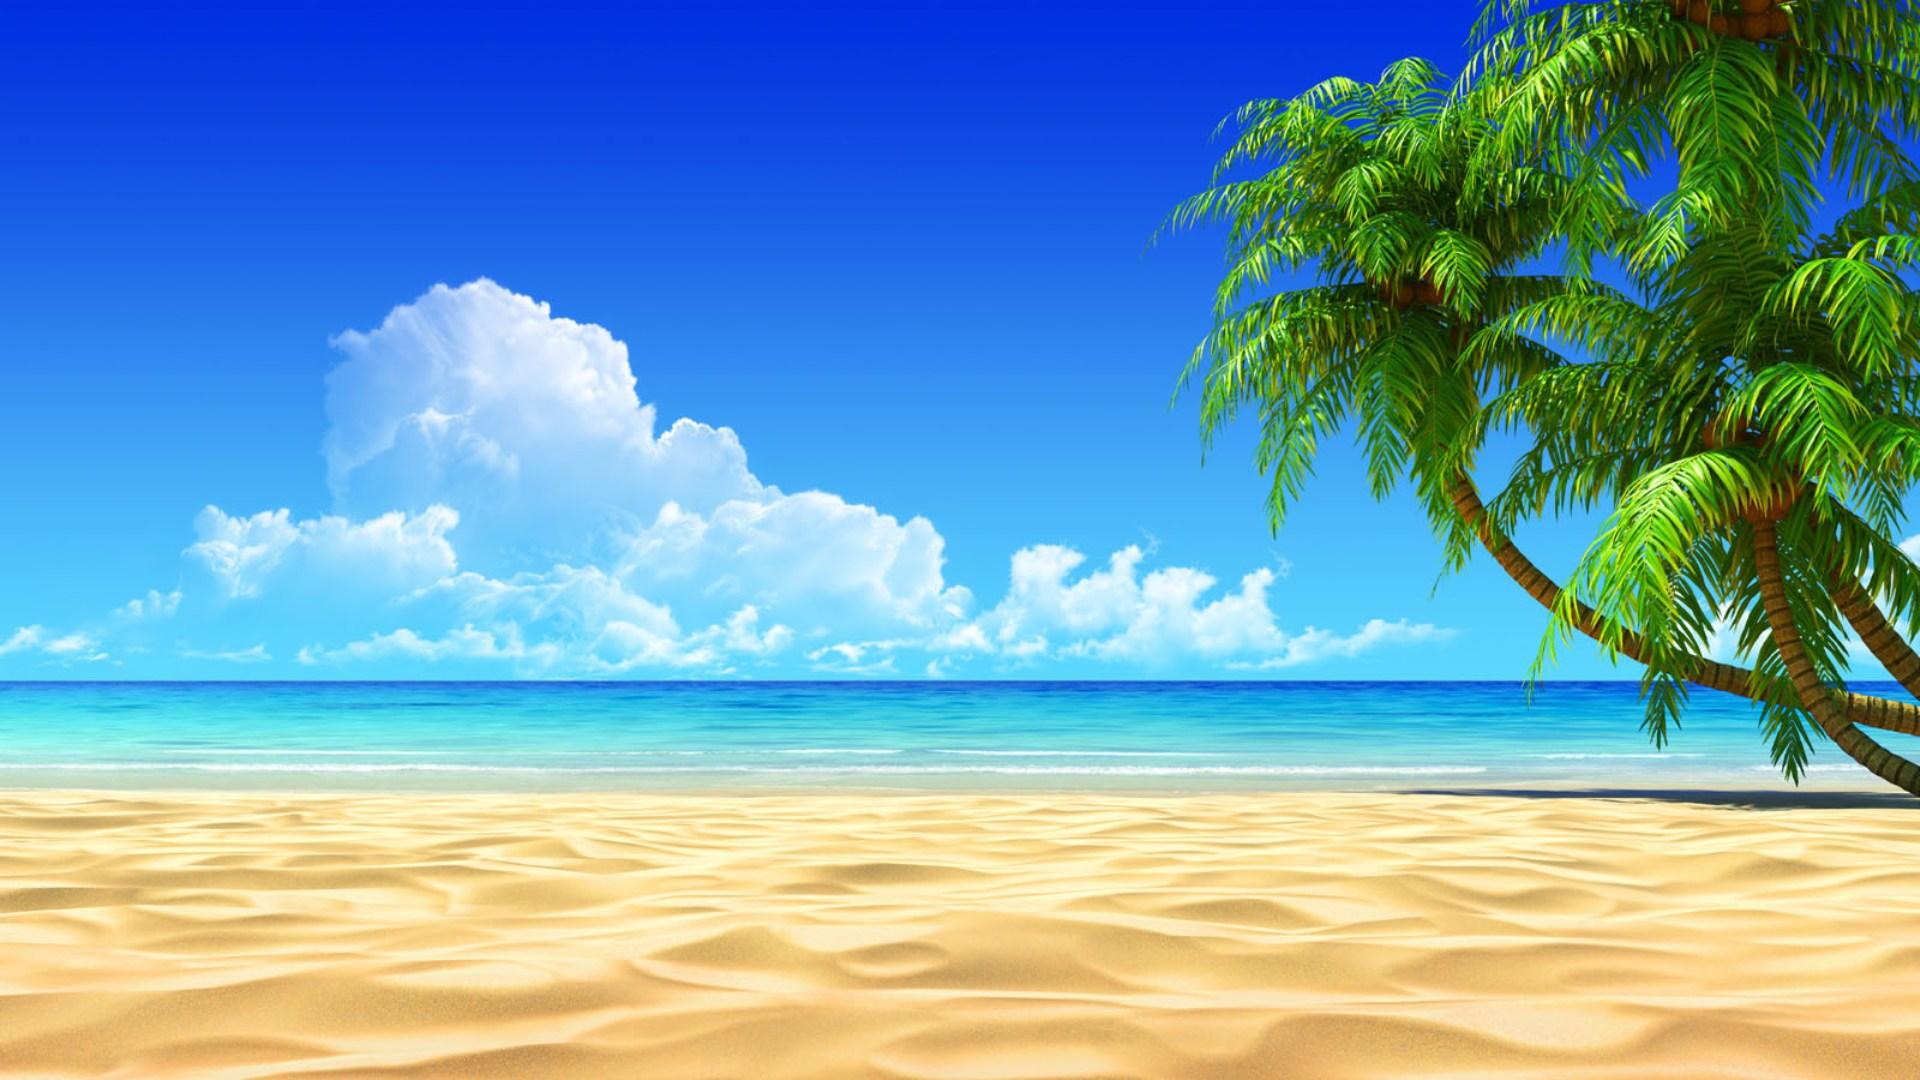 Free Beach Background wallpaper | 1920x1080 | #82680